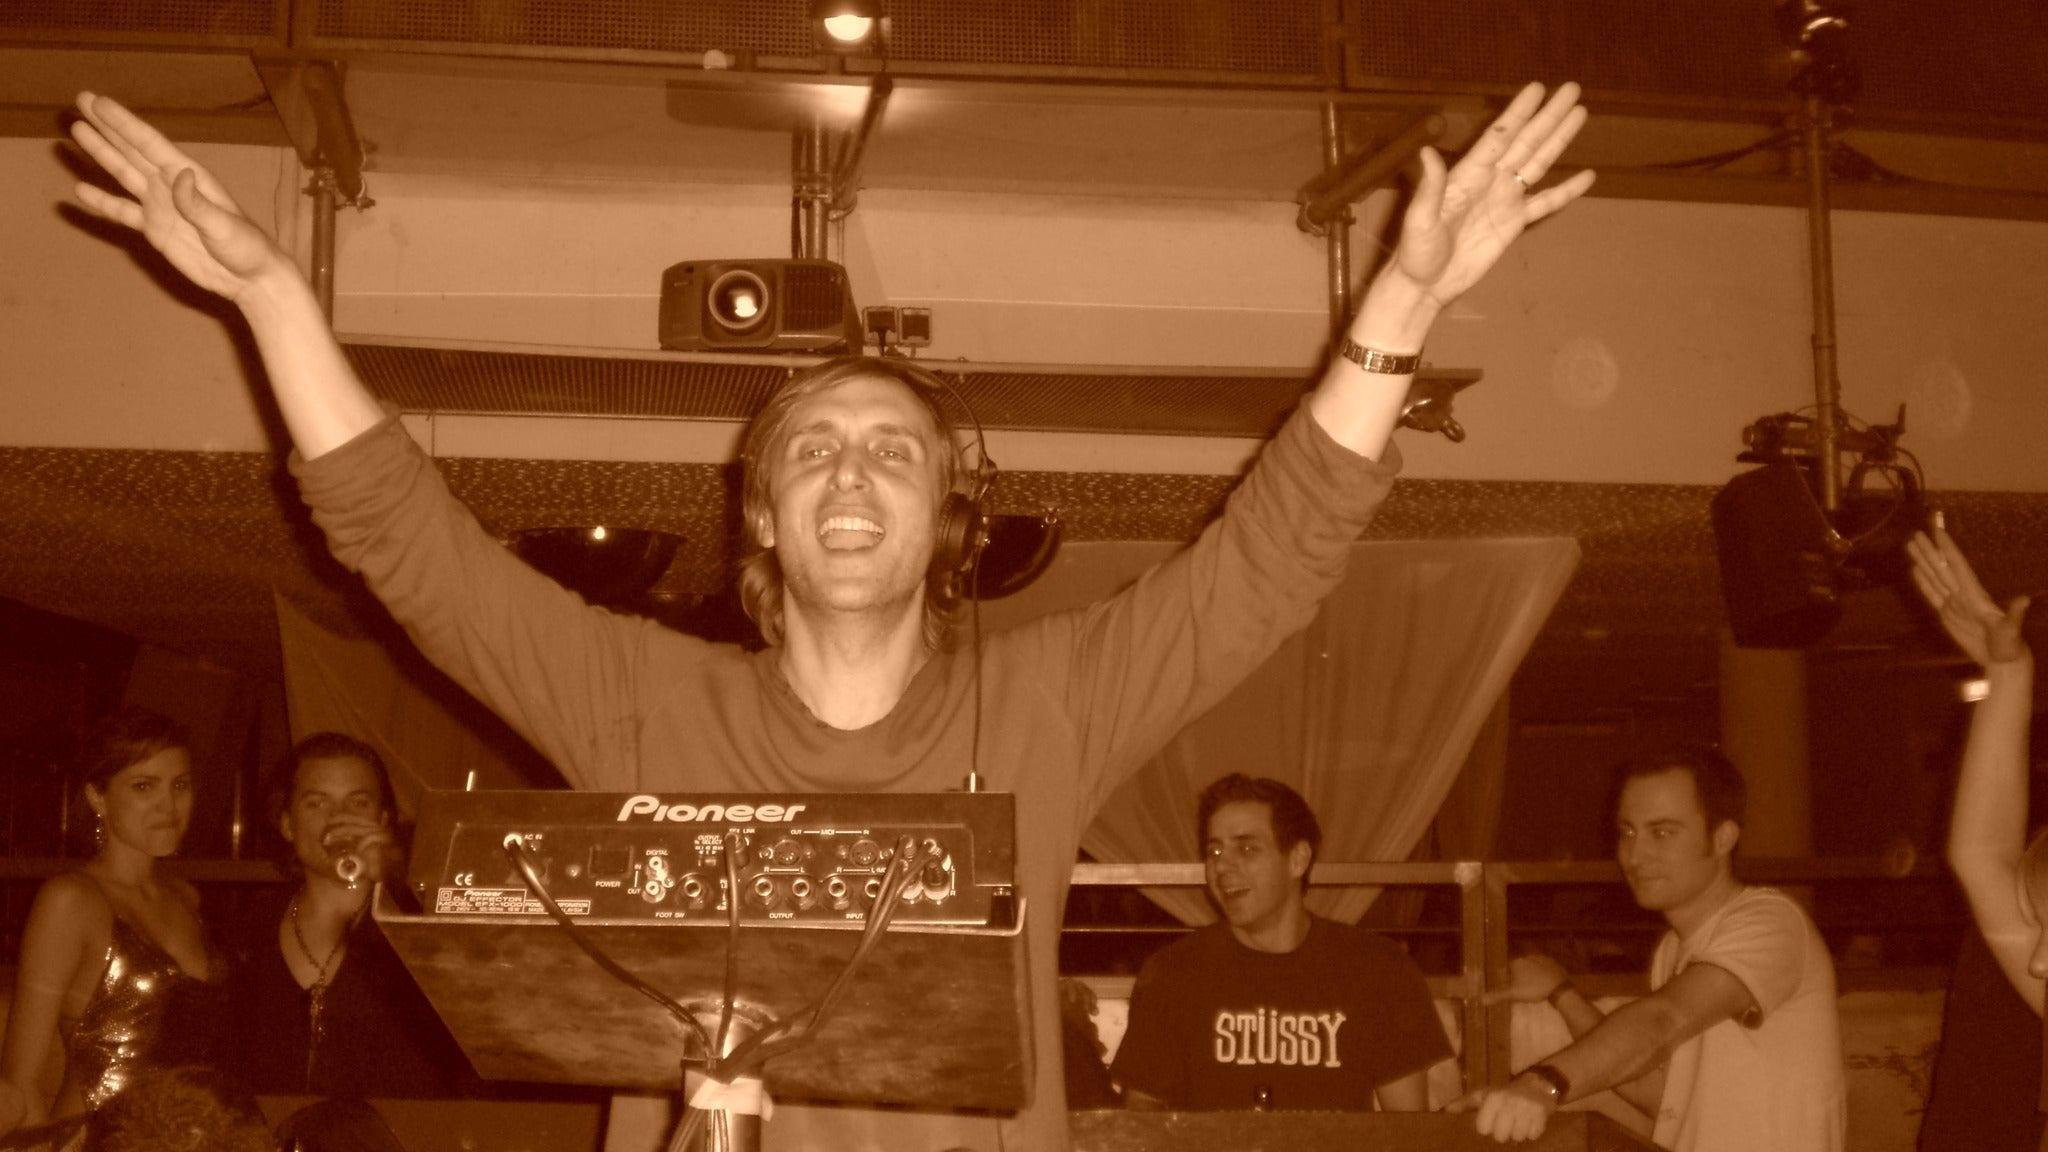 David Guetta at Echostage